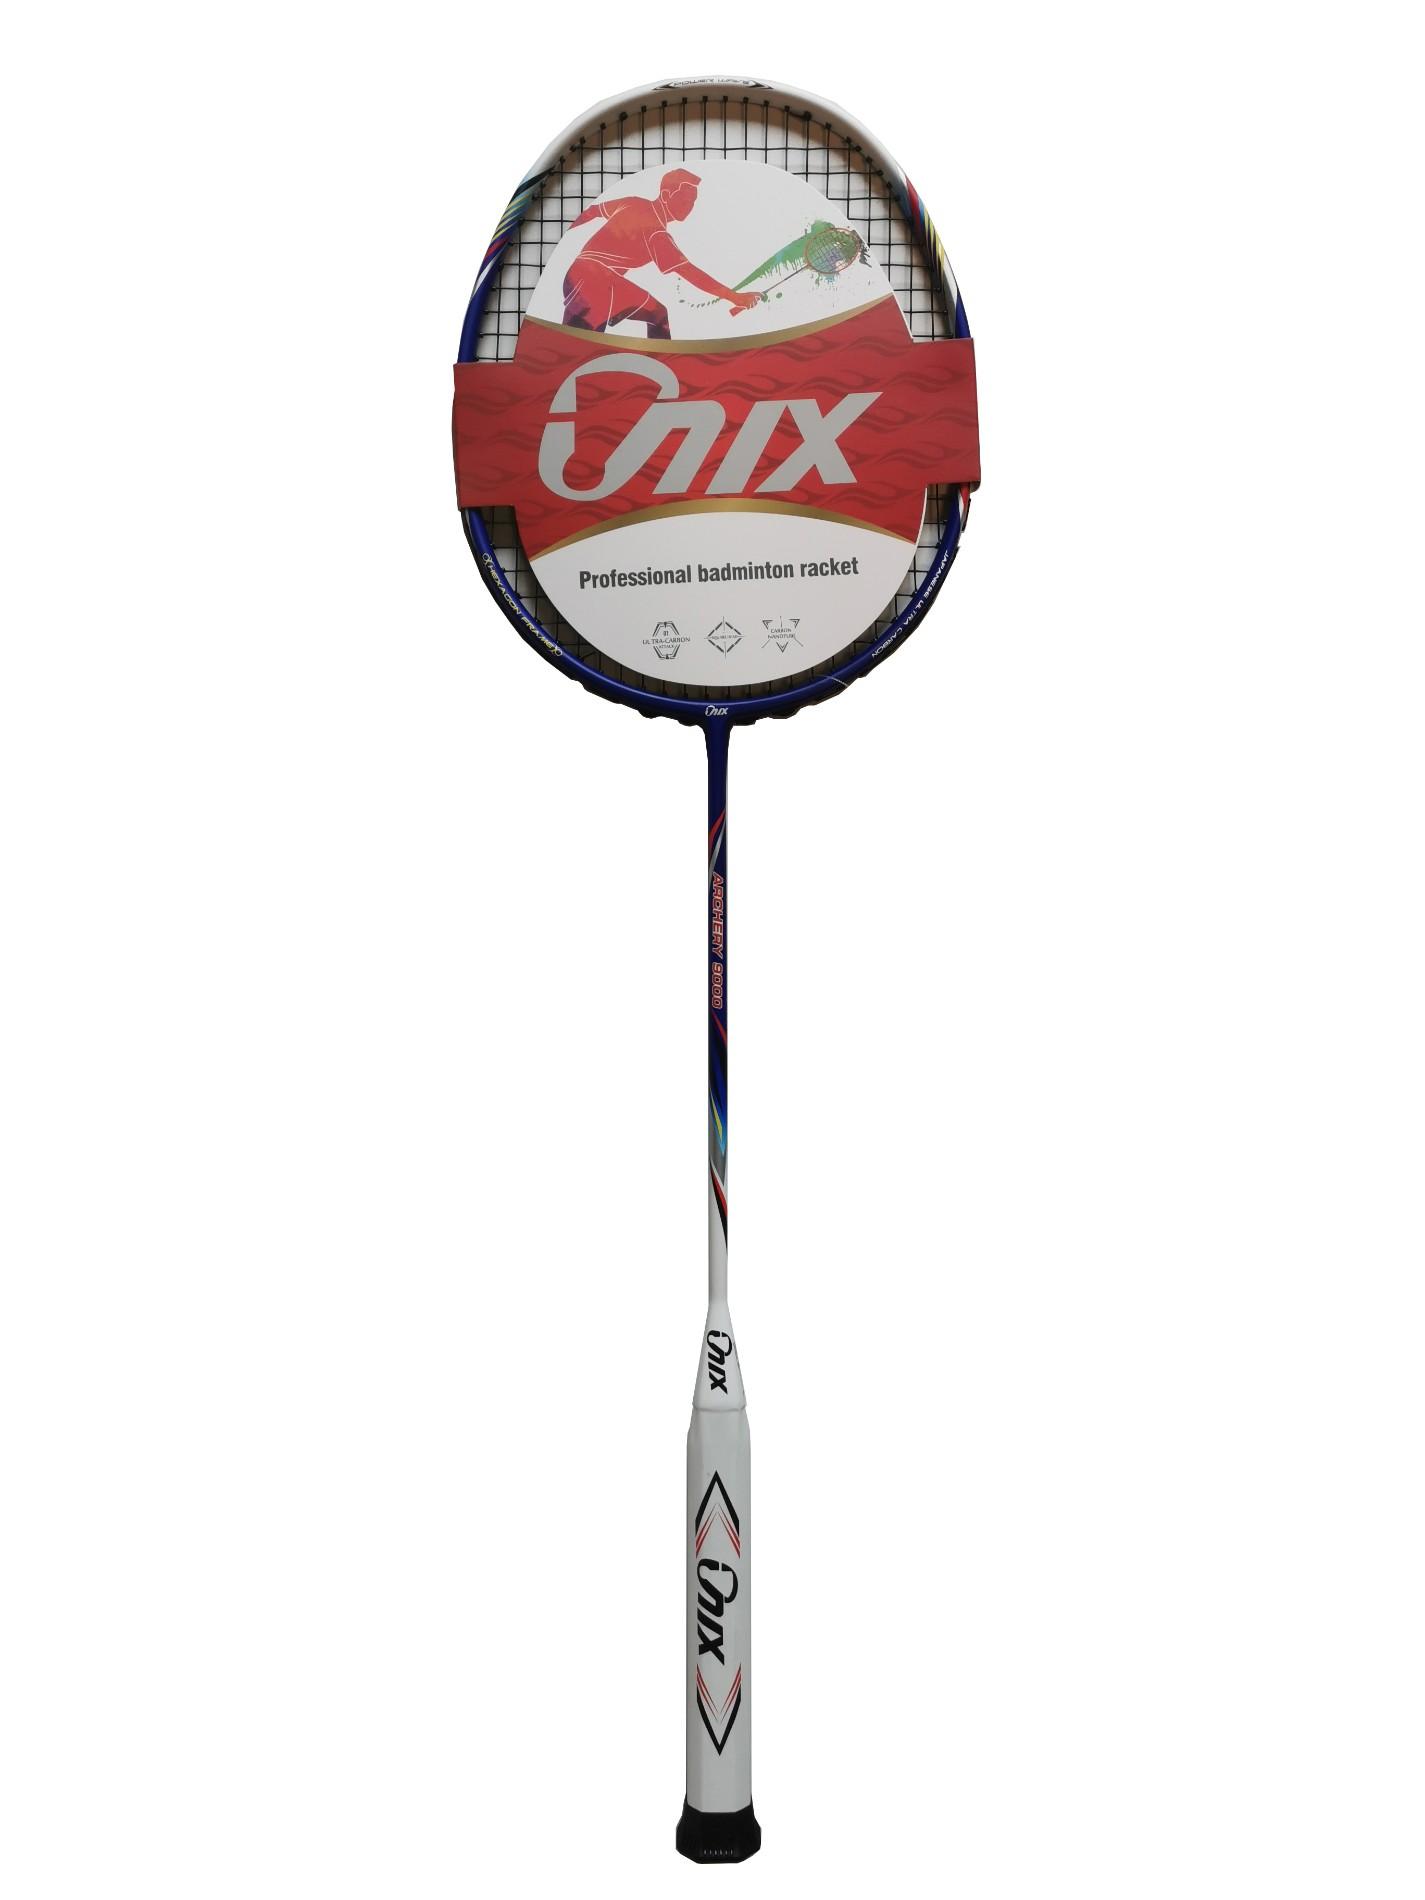 Hot sales for Full Carbon Badminton Racket Manufacturers, Hot sales for Full Carbon Badminton Racket Factory, Supply Hot sales for Full Carbon Badminton Racket